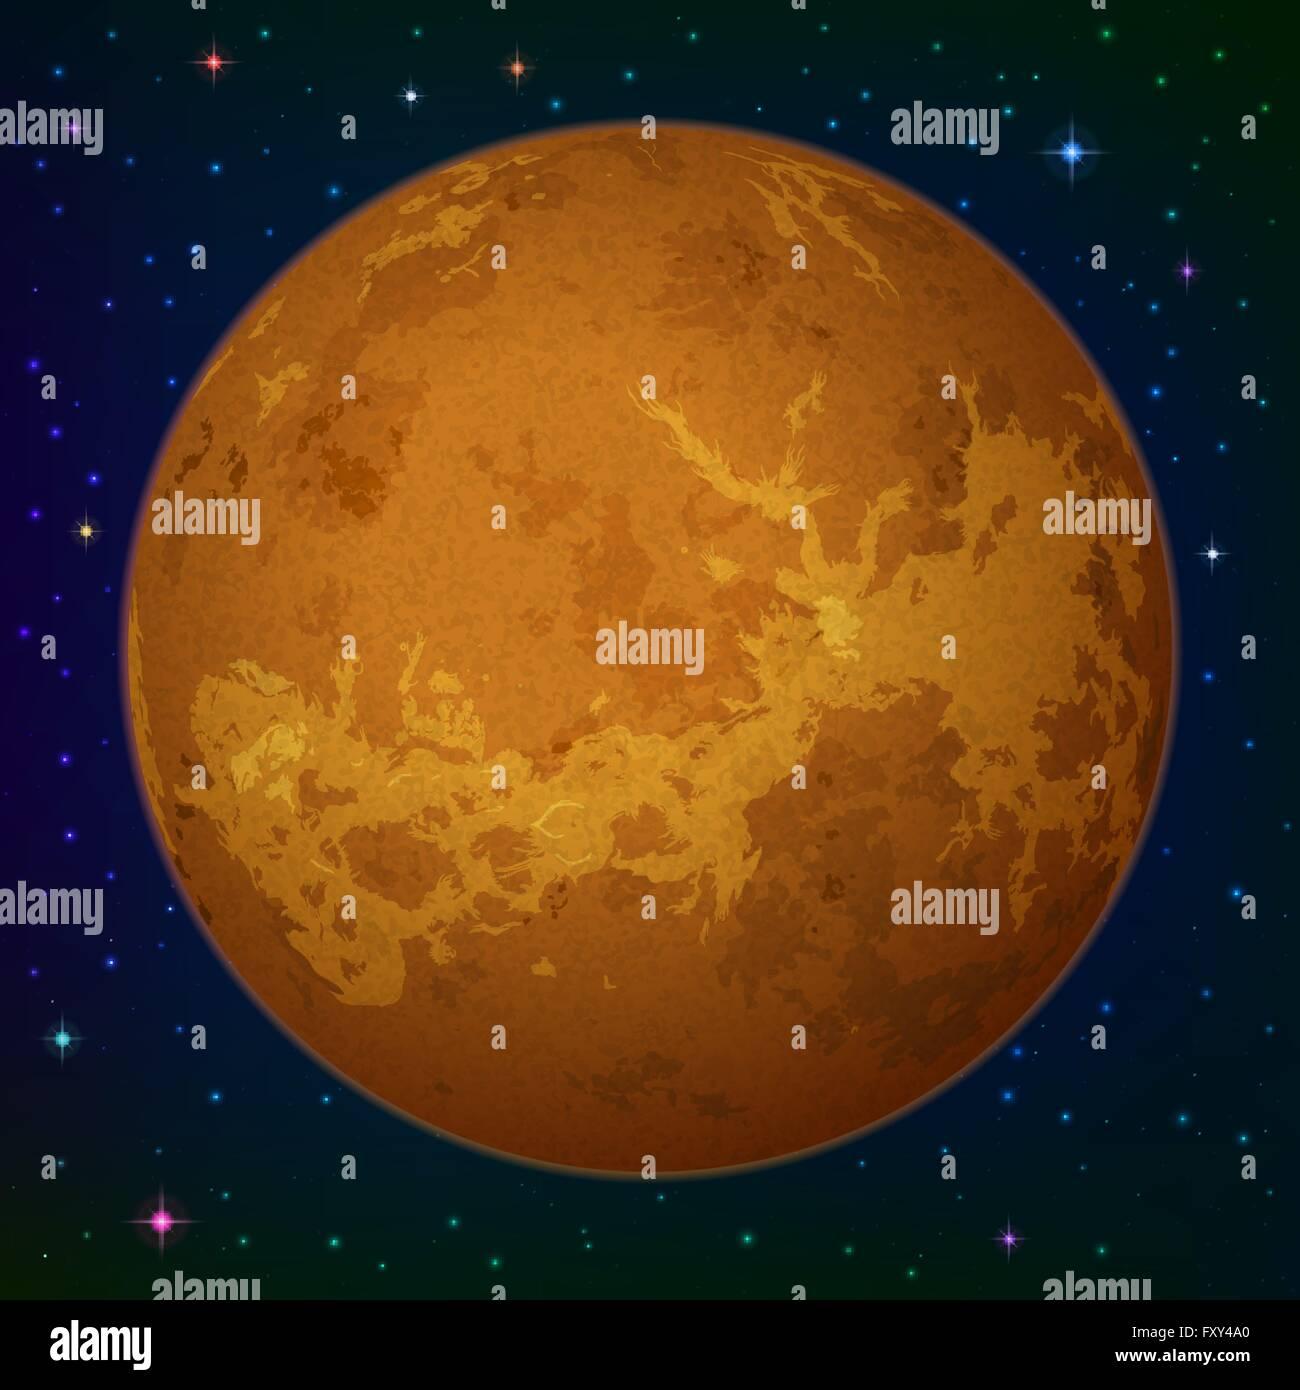 Planet Venus in space - Stock Image